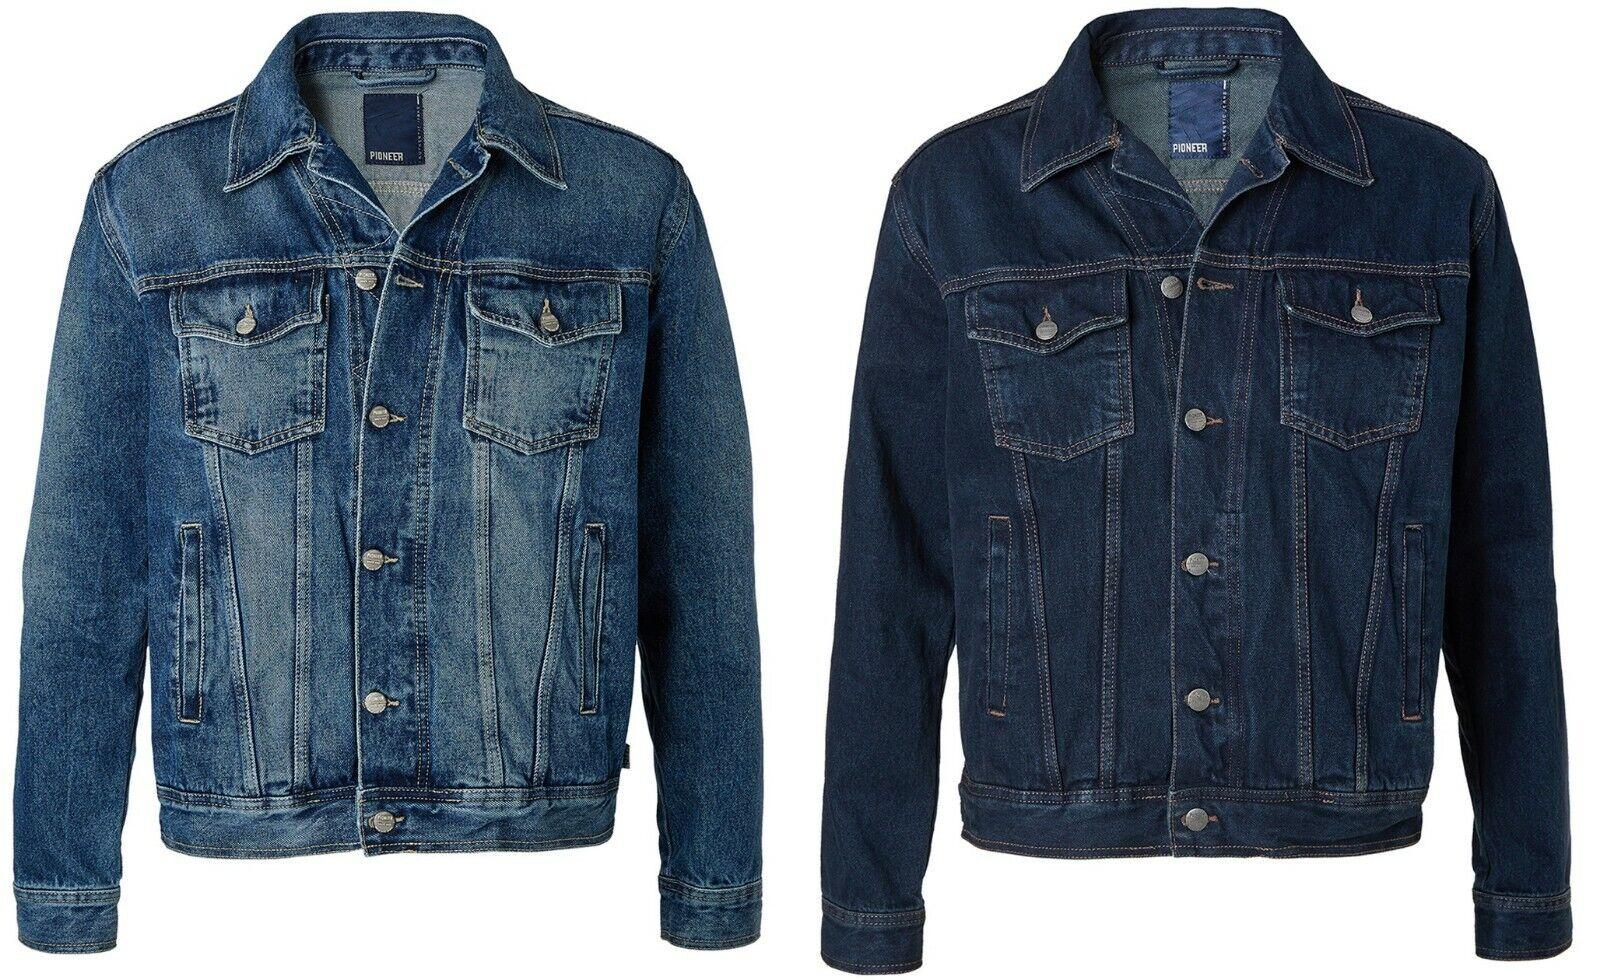 Pioneer Herren Jeans Jacket Jeansjacke Denim VK:  € 79,95